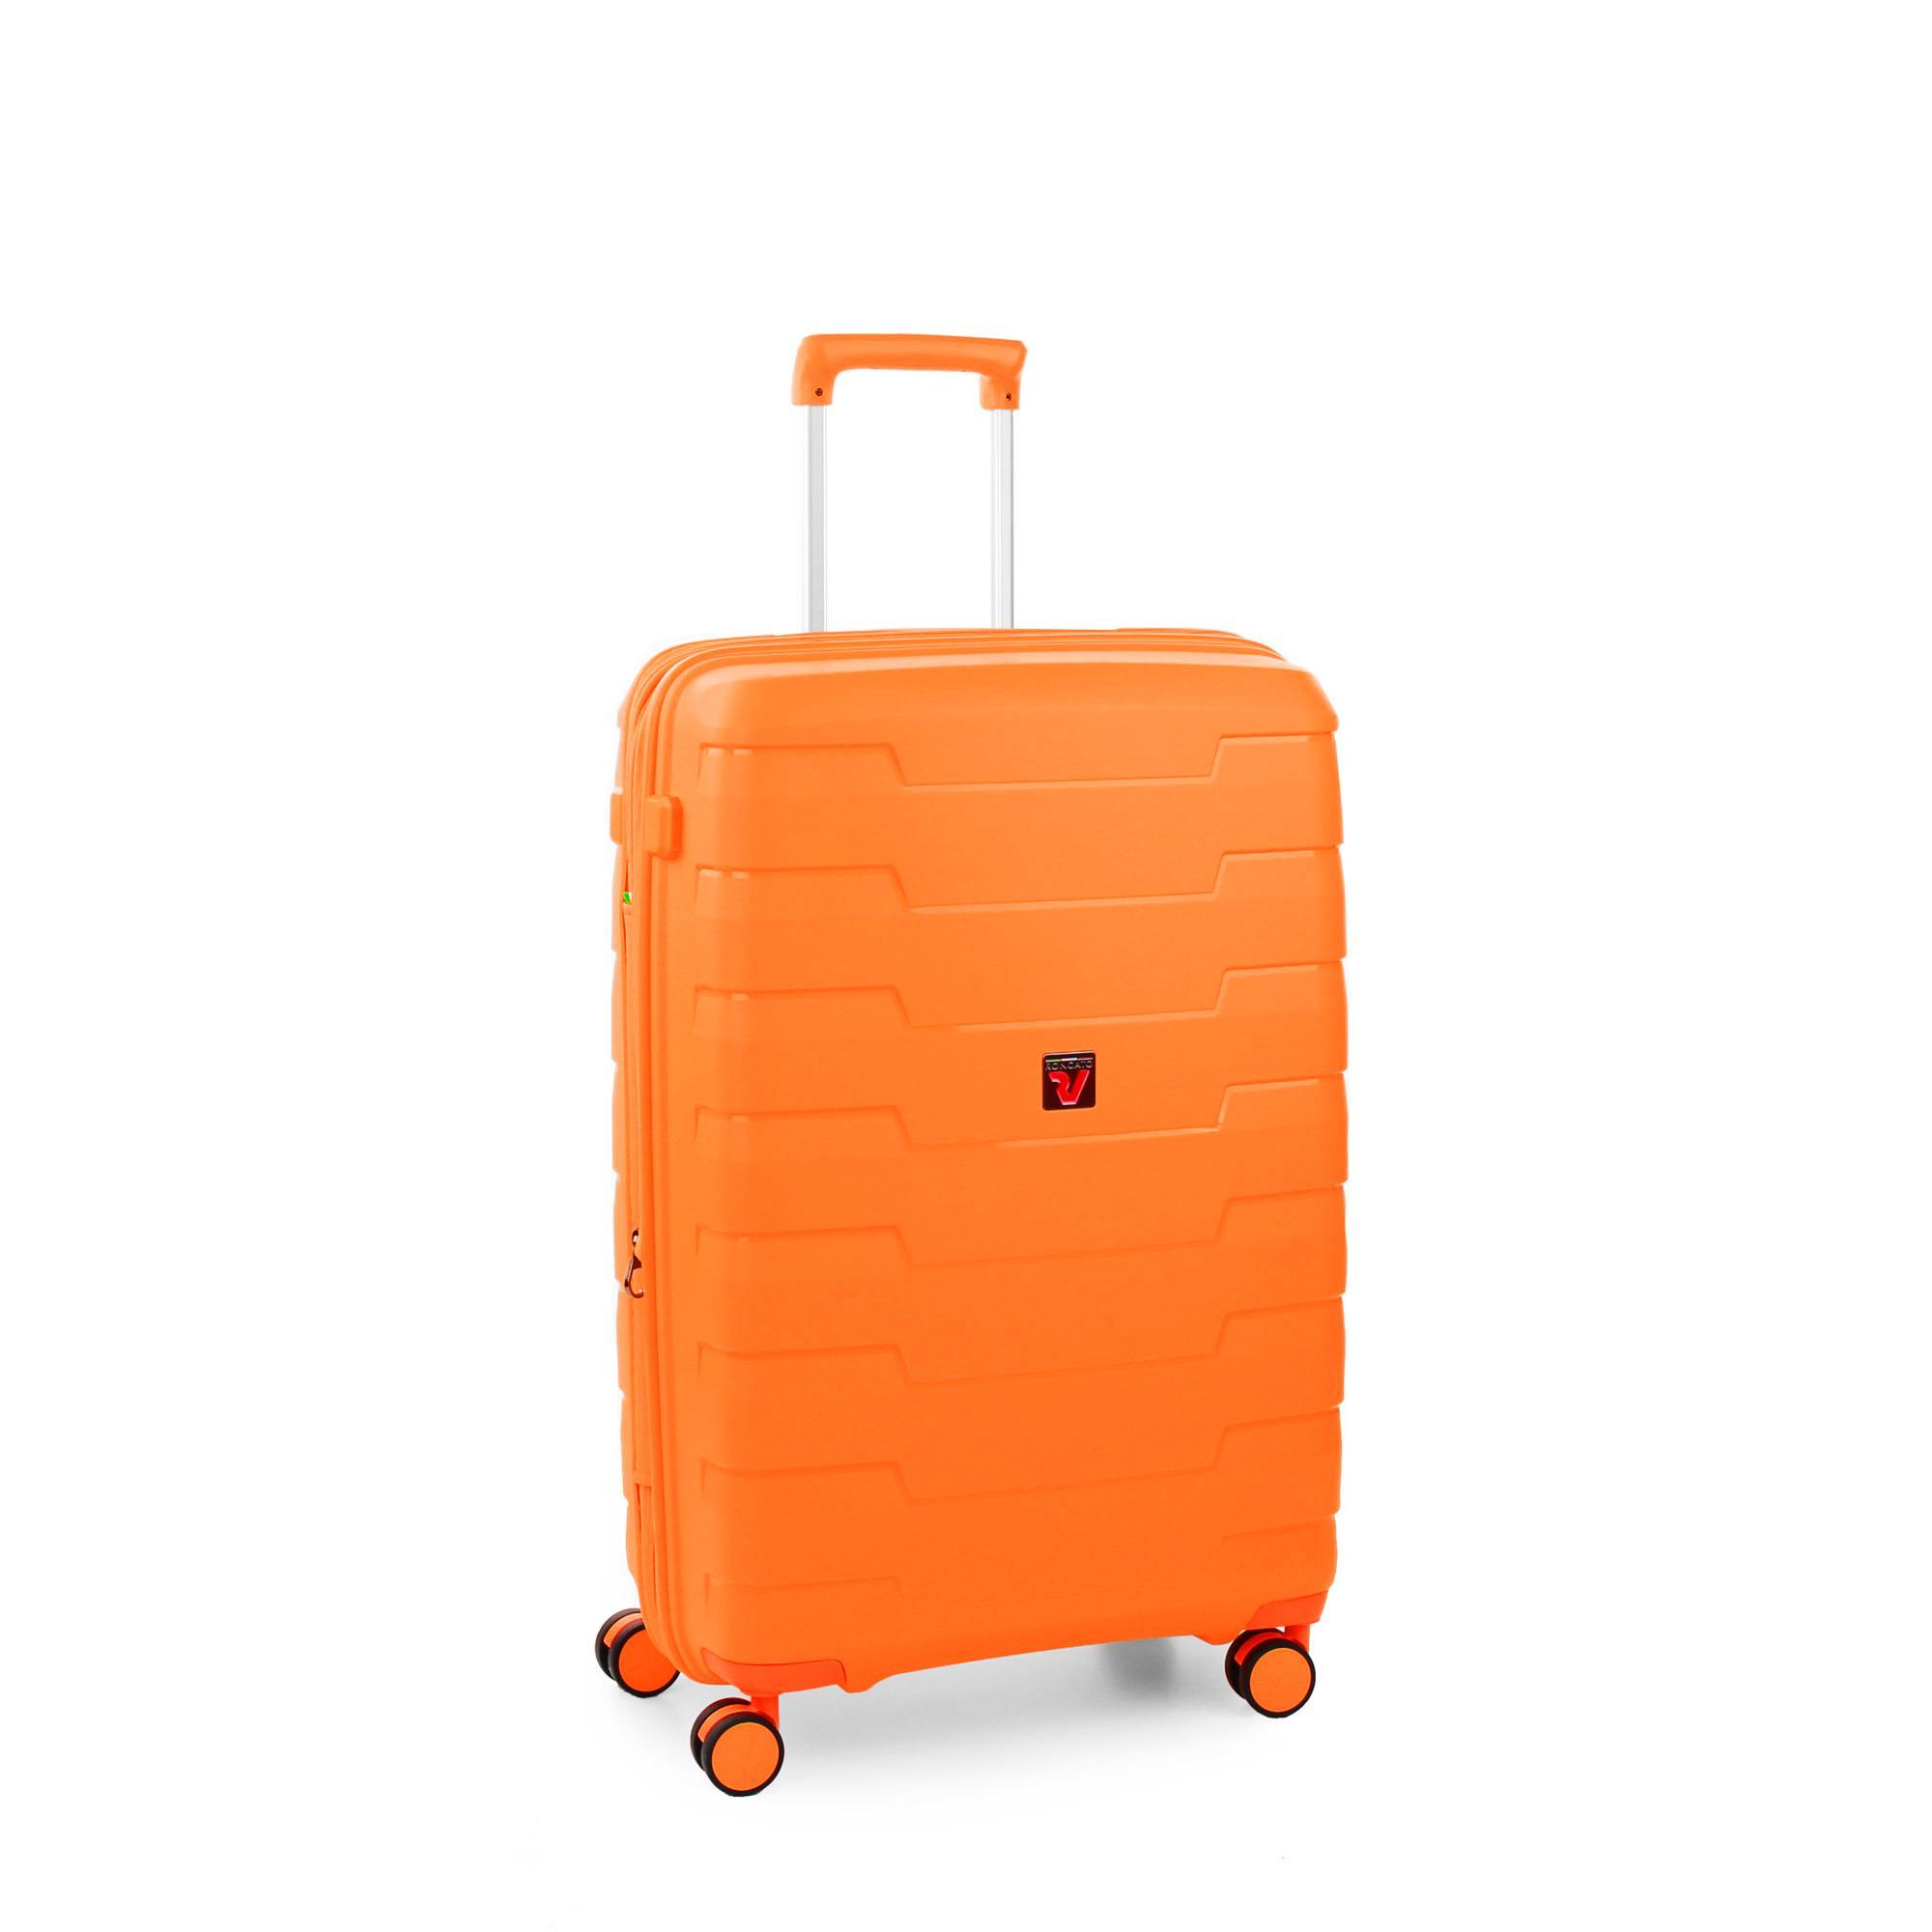 Medium Luggage